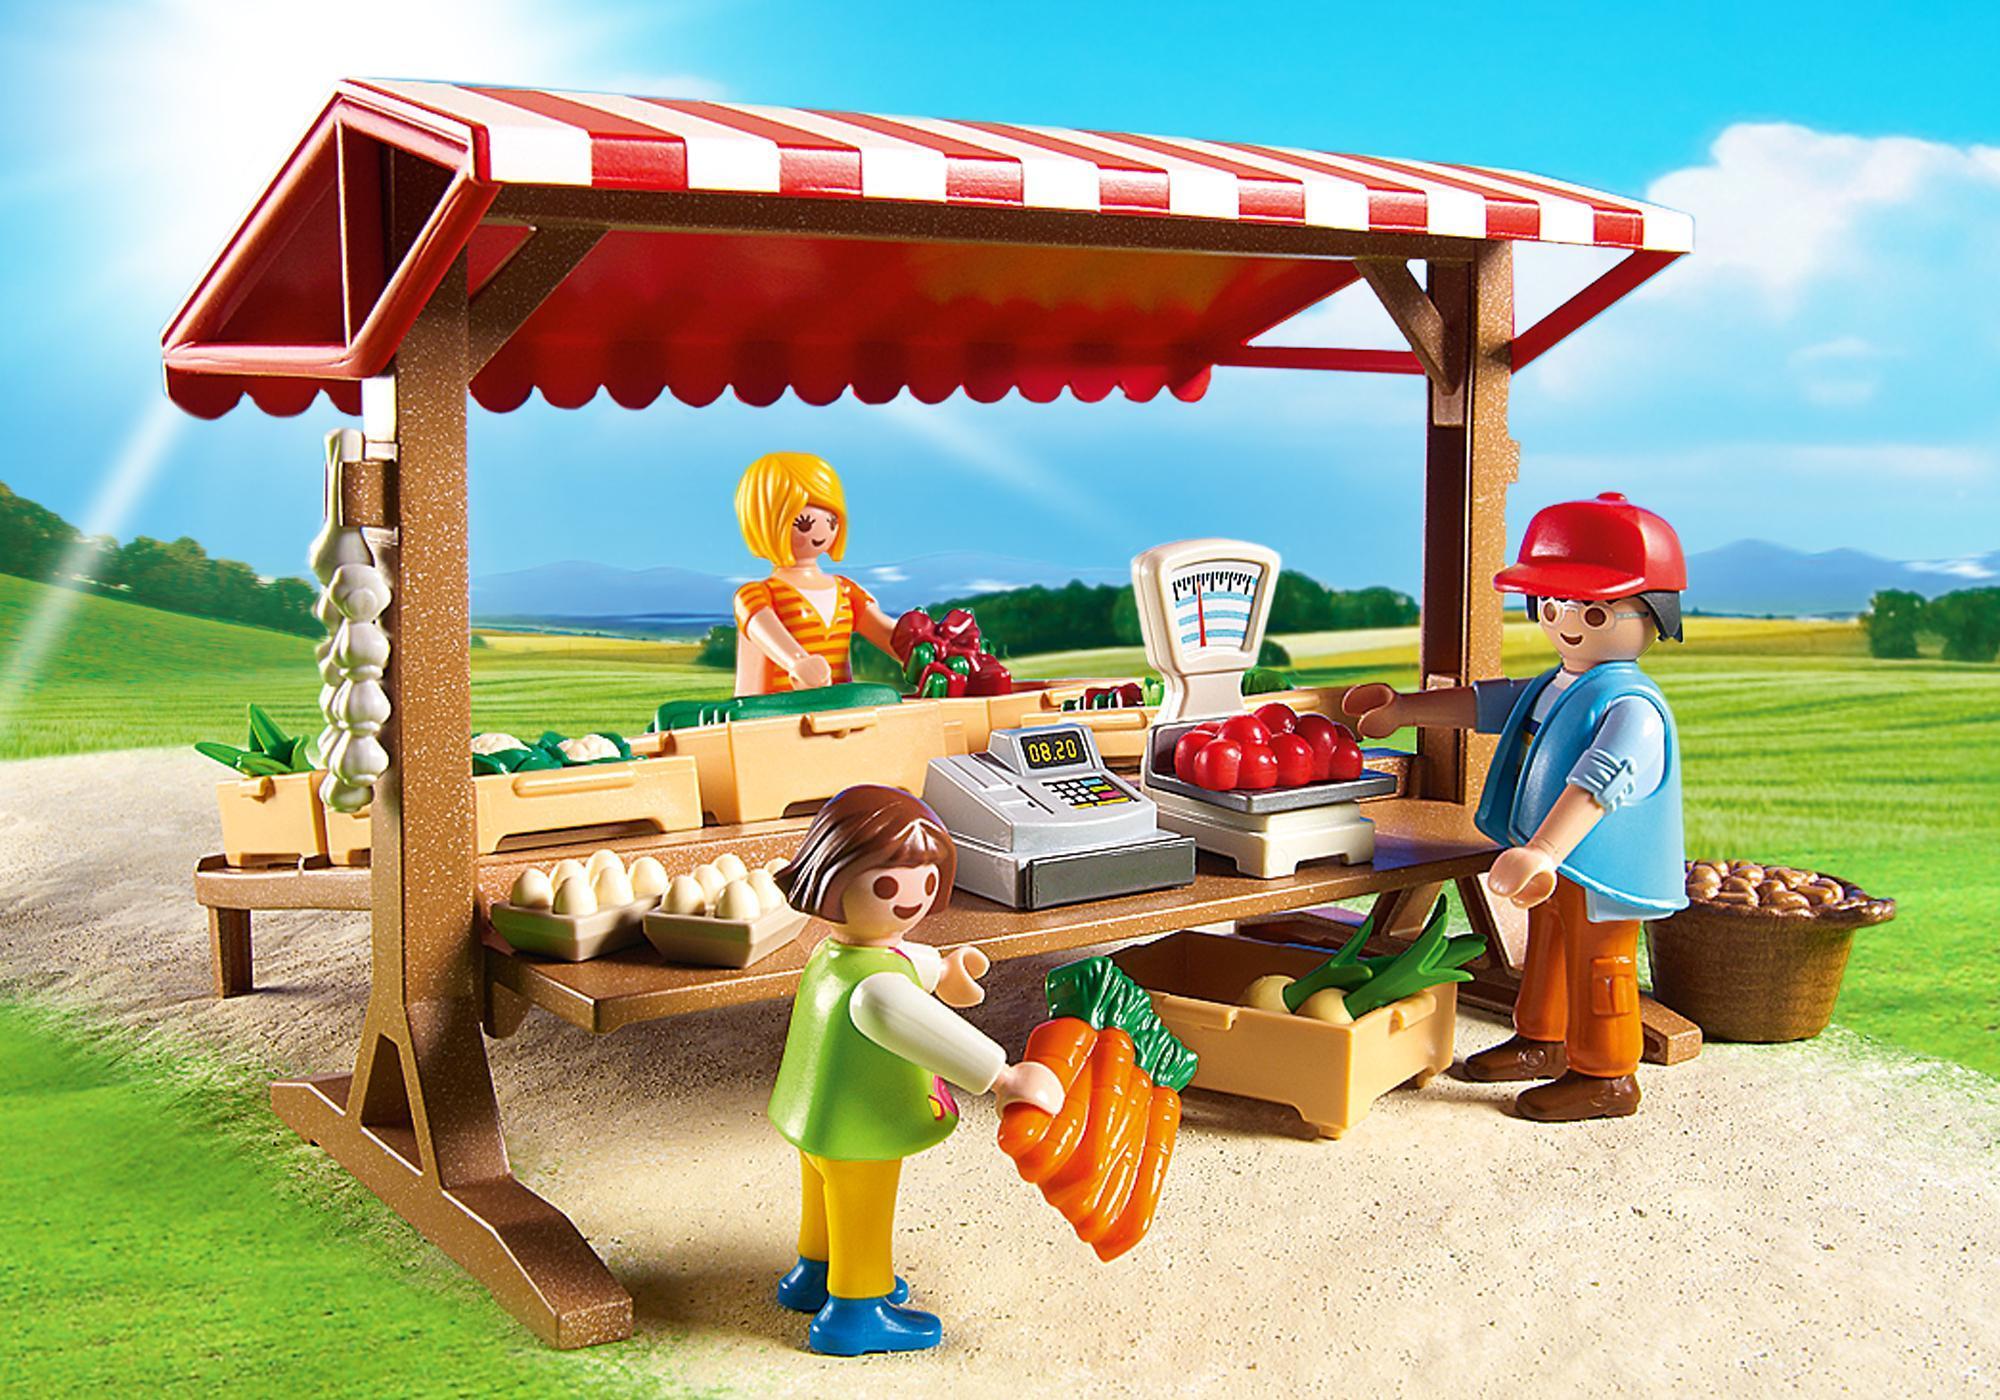 http://media.playmobil.com/i/playmobil/6121_product_extra1/Marchand avec étal de légumes